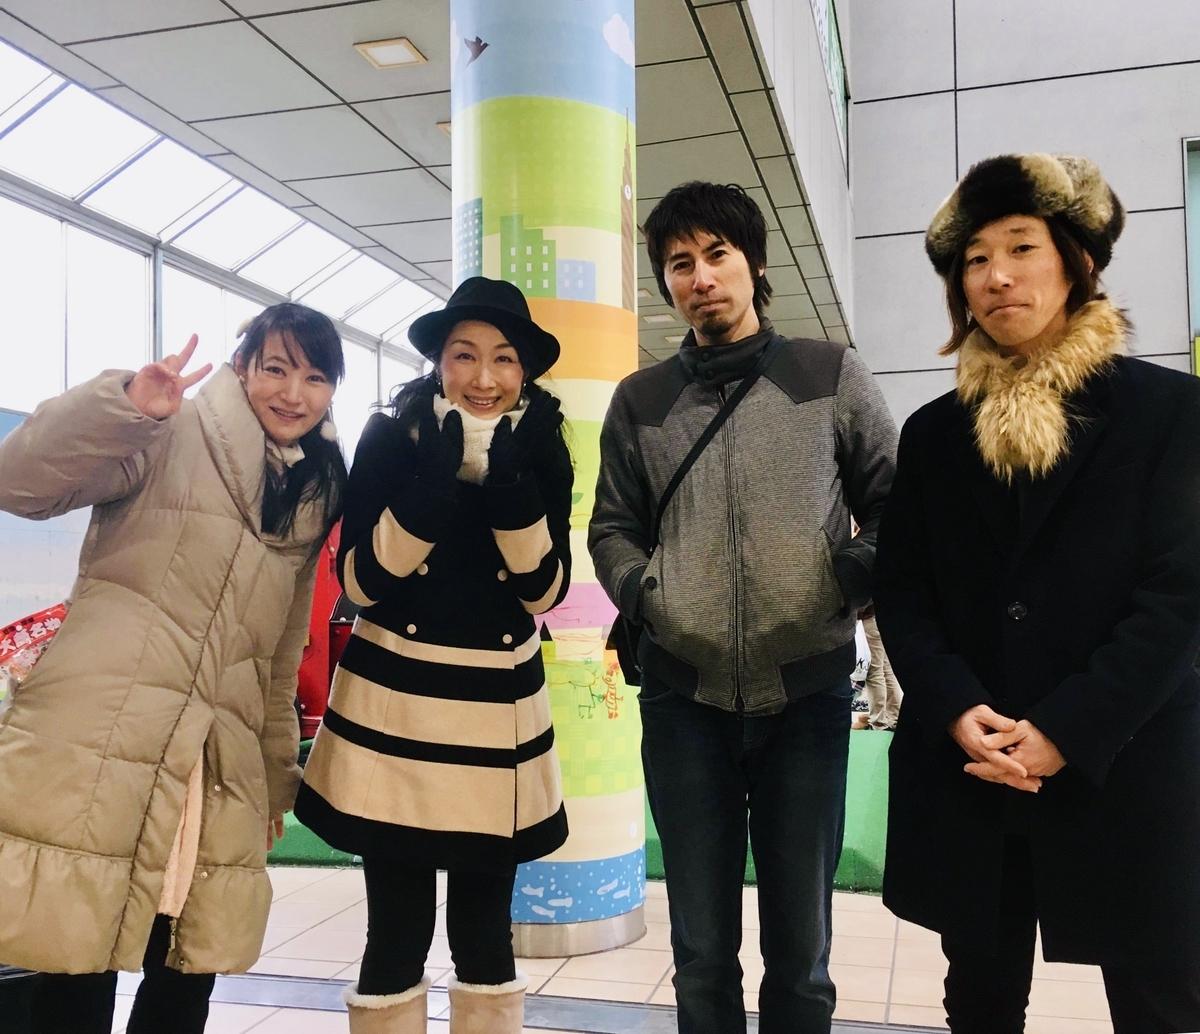 f:id:KizunaKiraKira:20191003073319j:plain